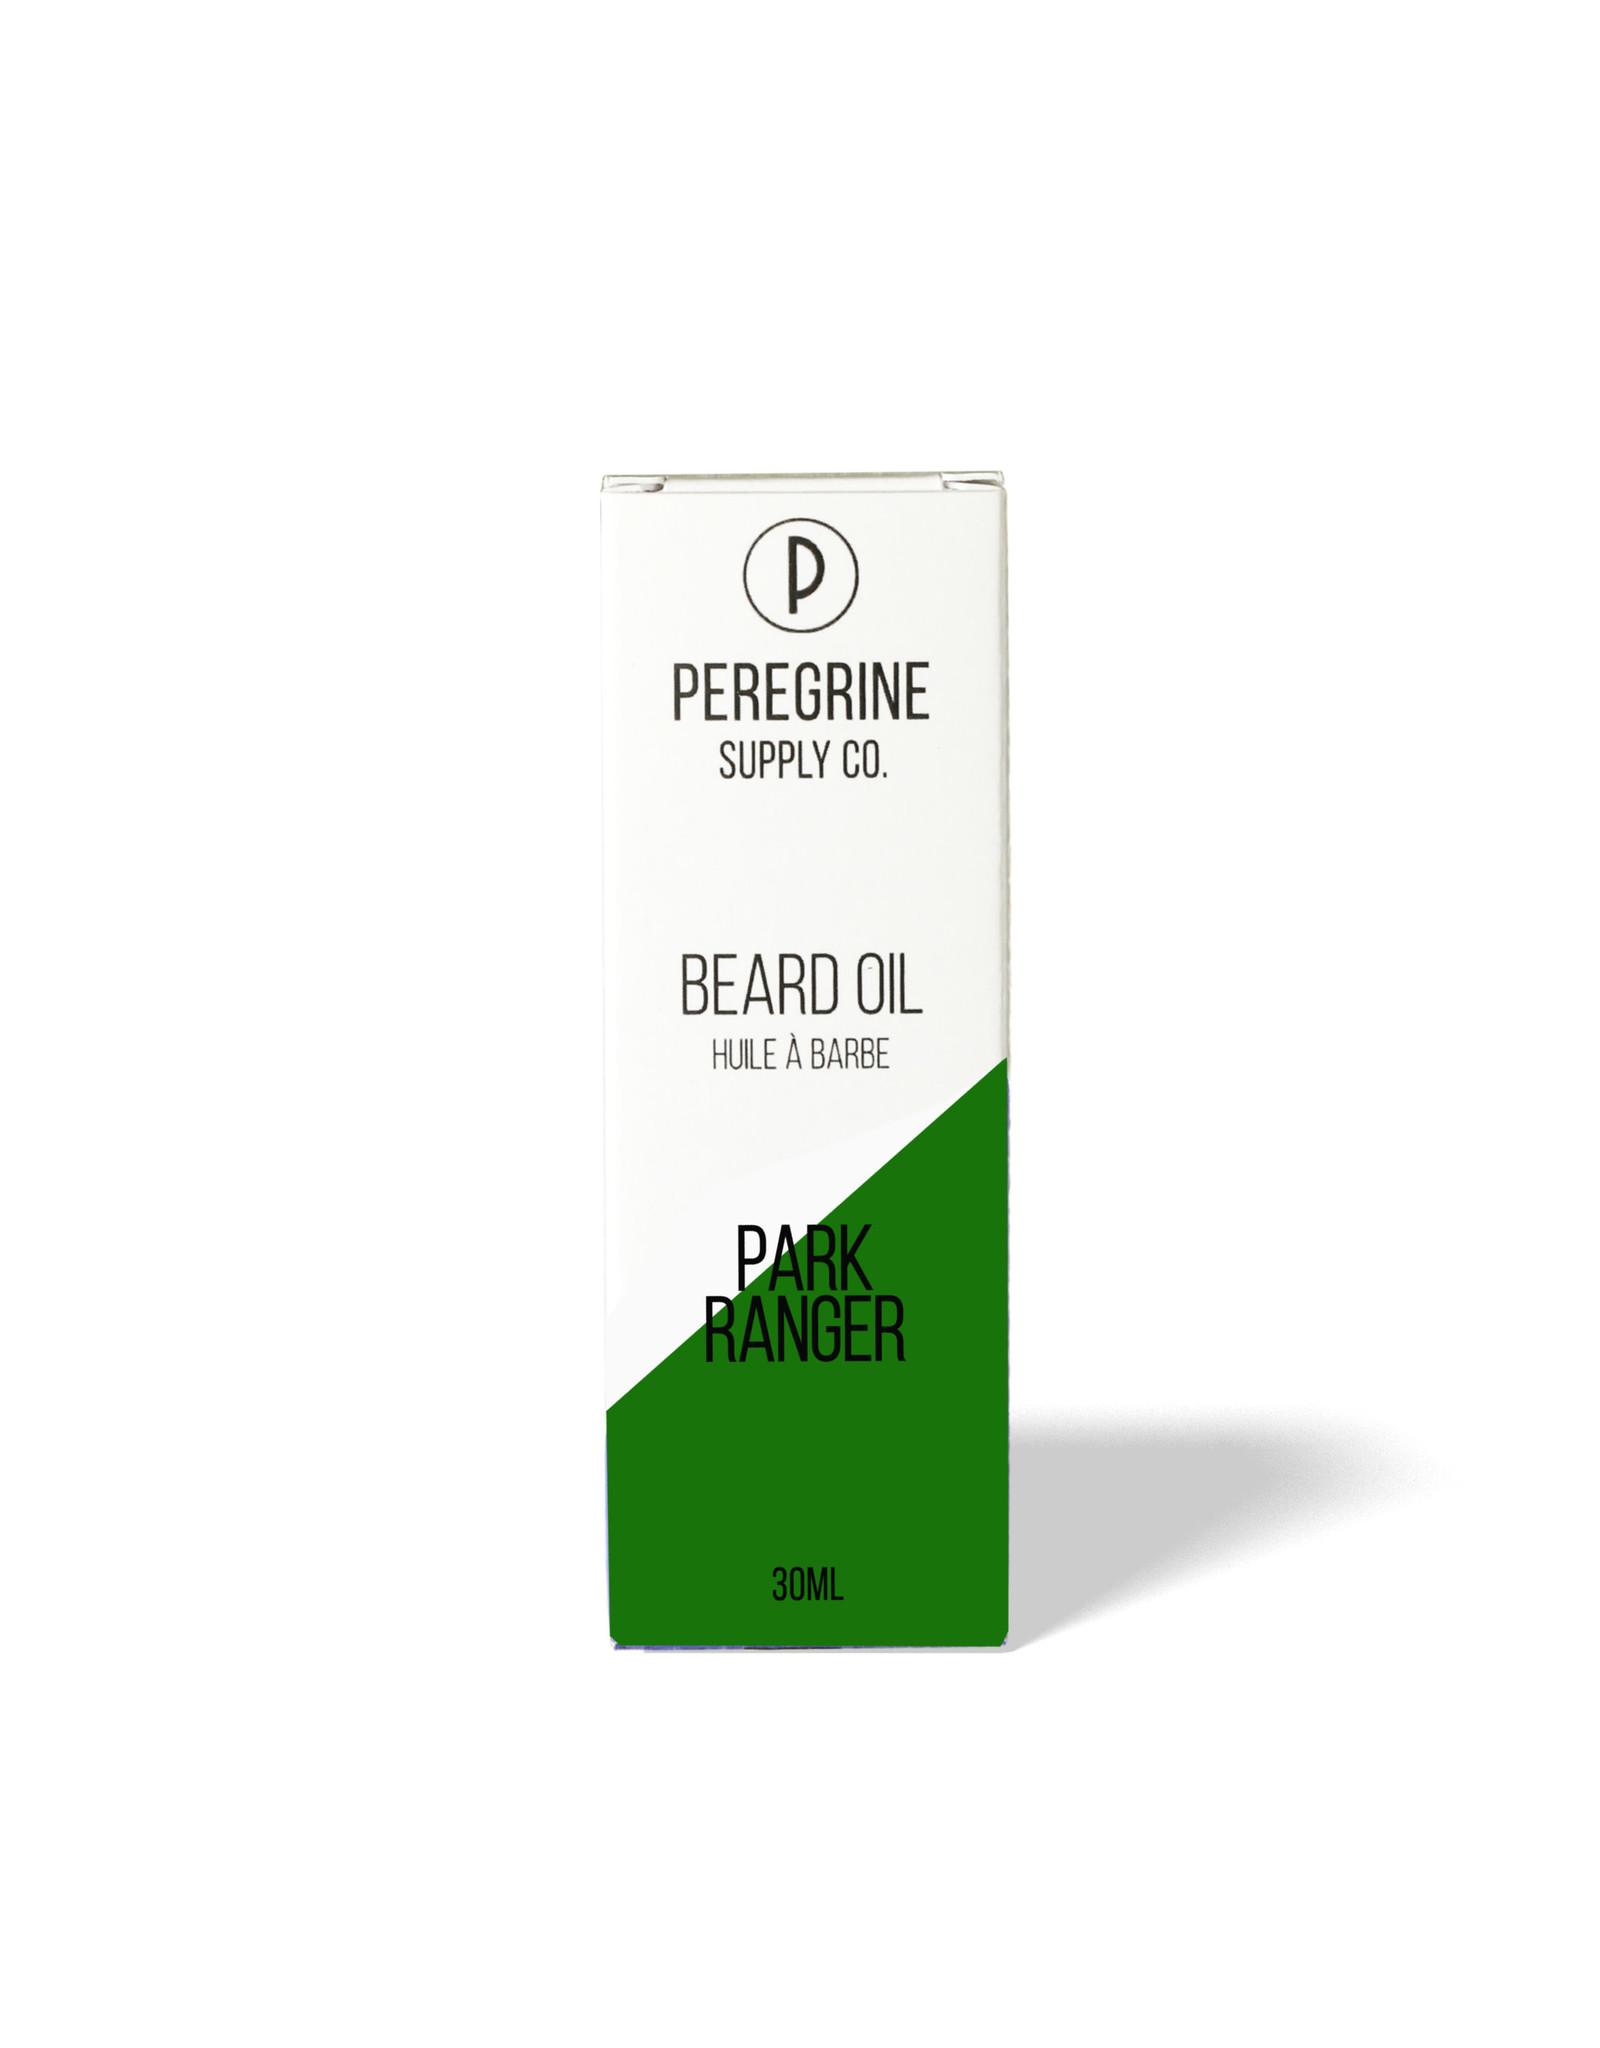 Peregrine Beard Oil